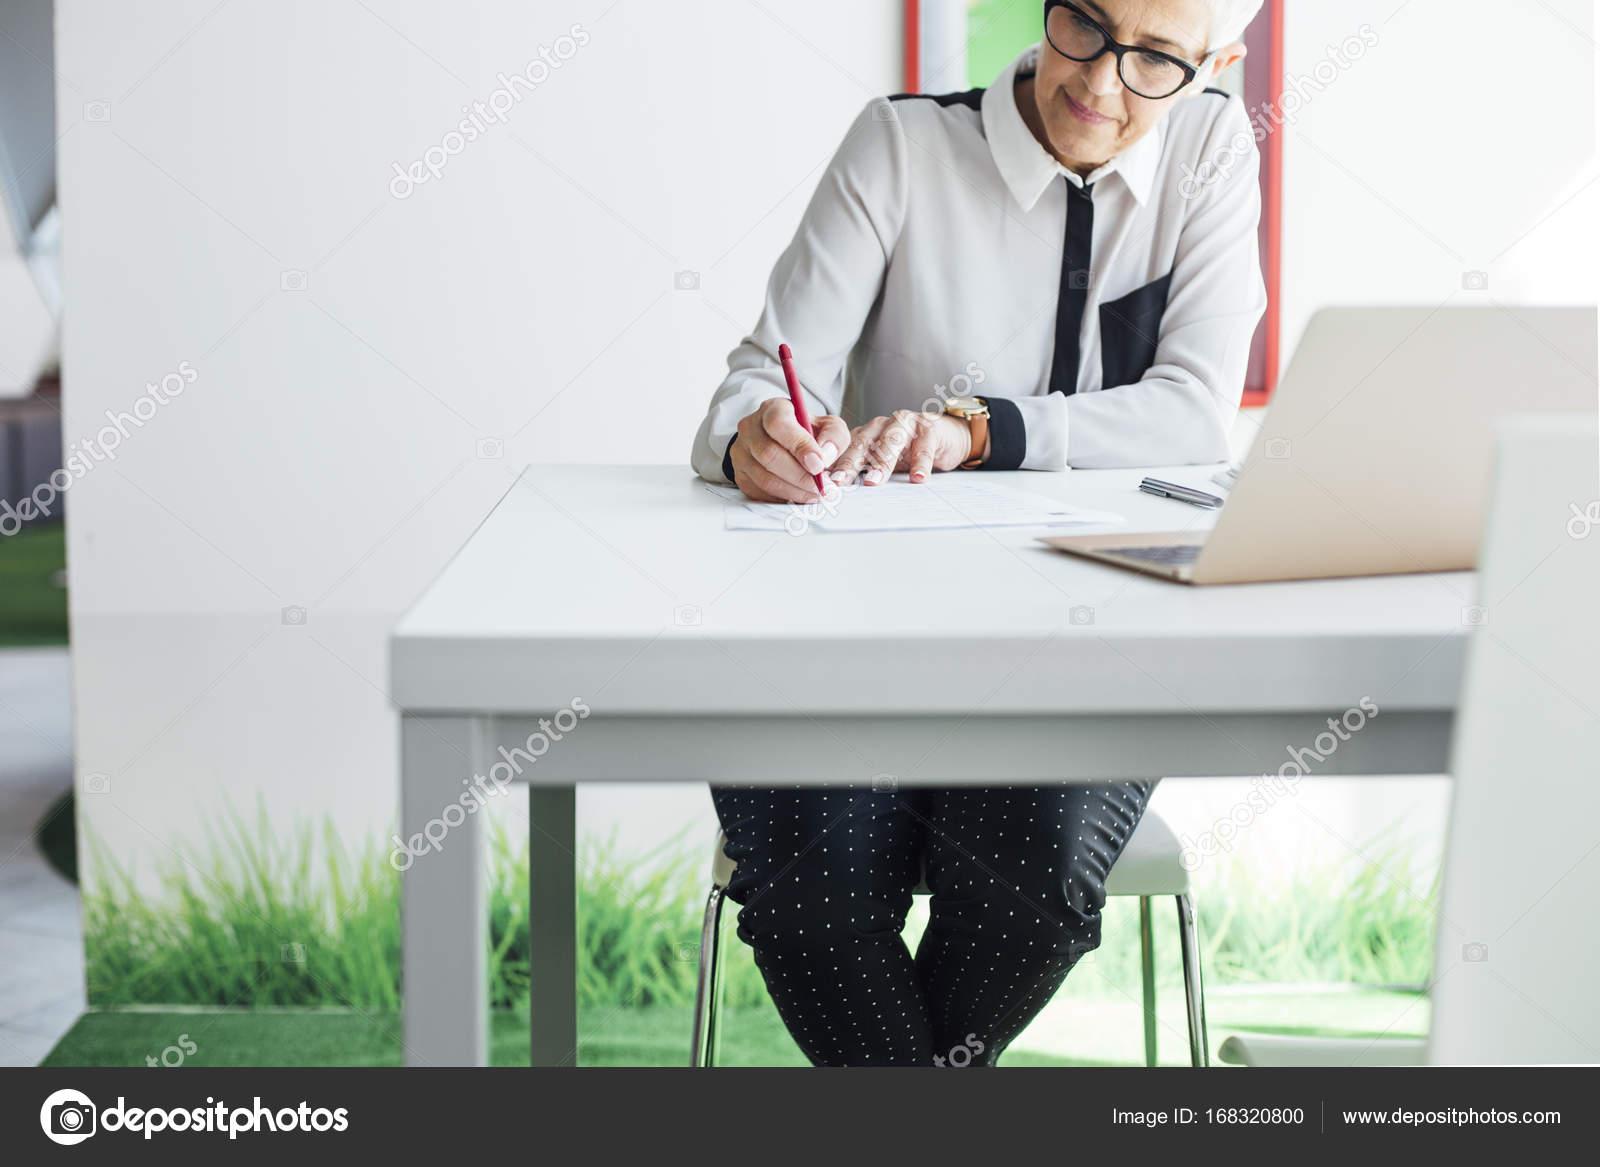 teacher grading exam papers stock photo luminastock 168320800